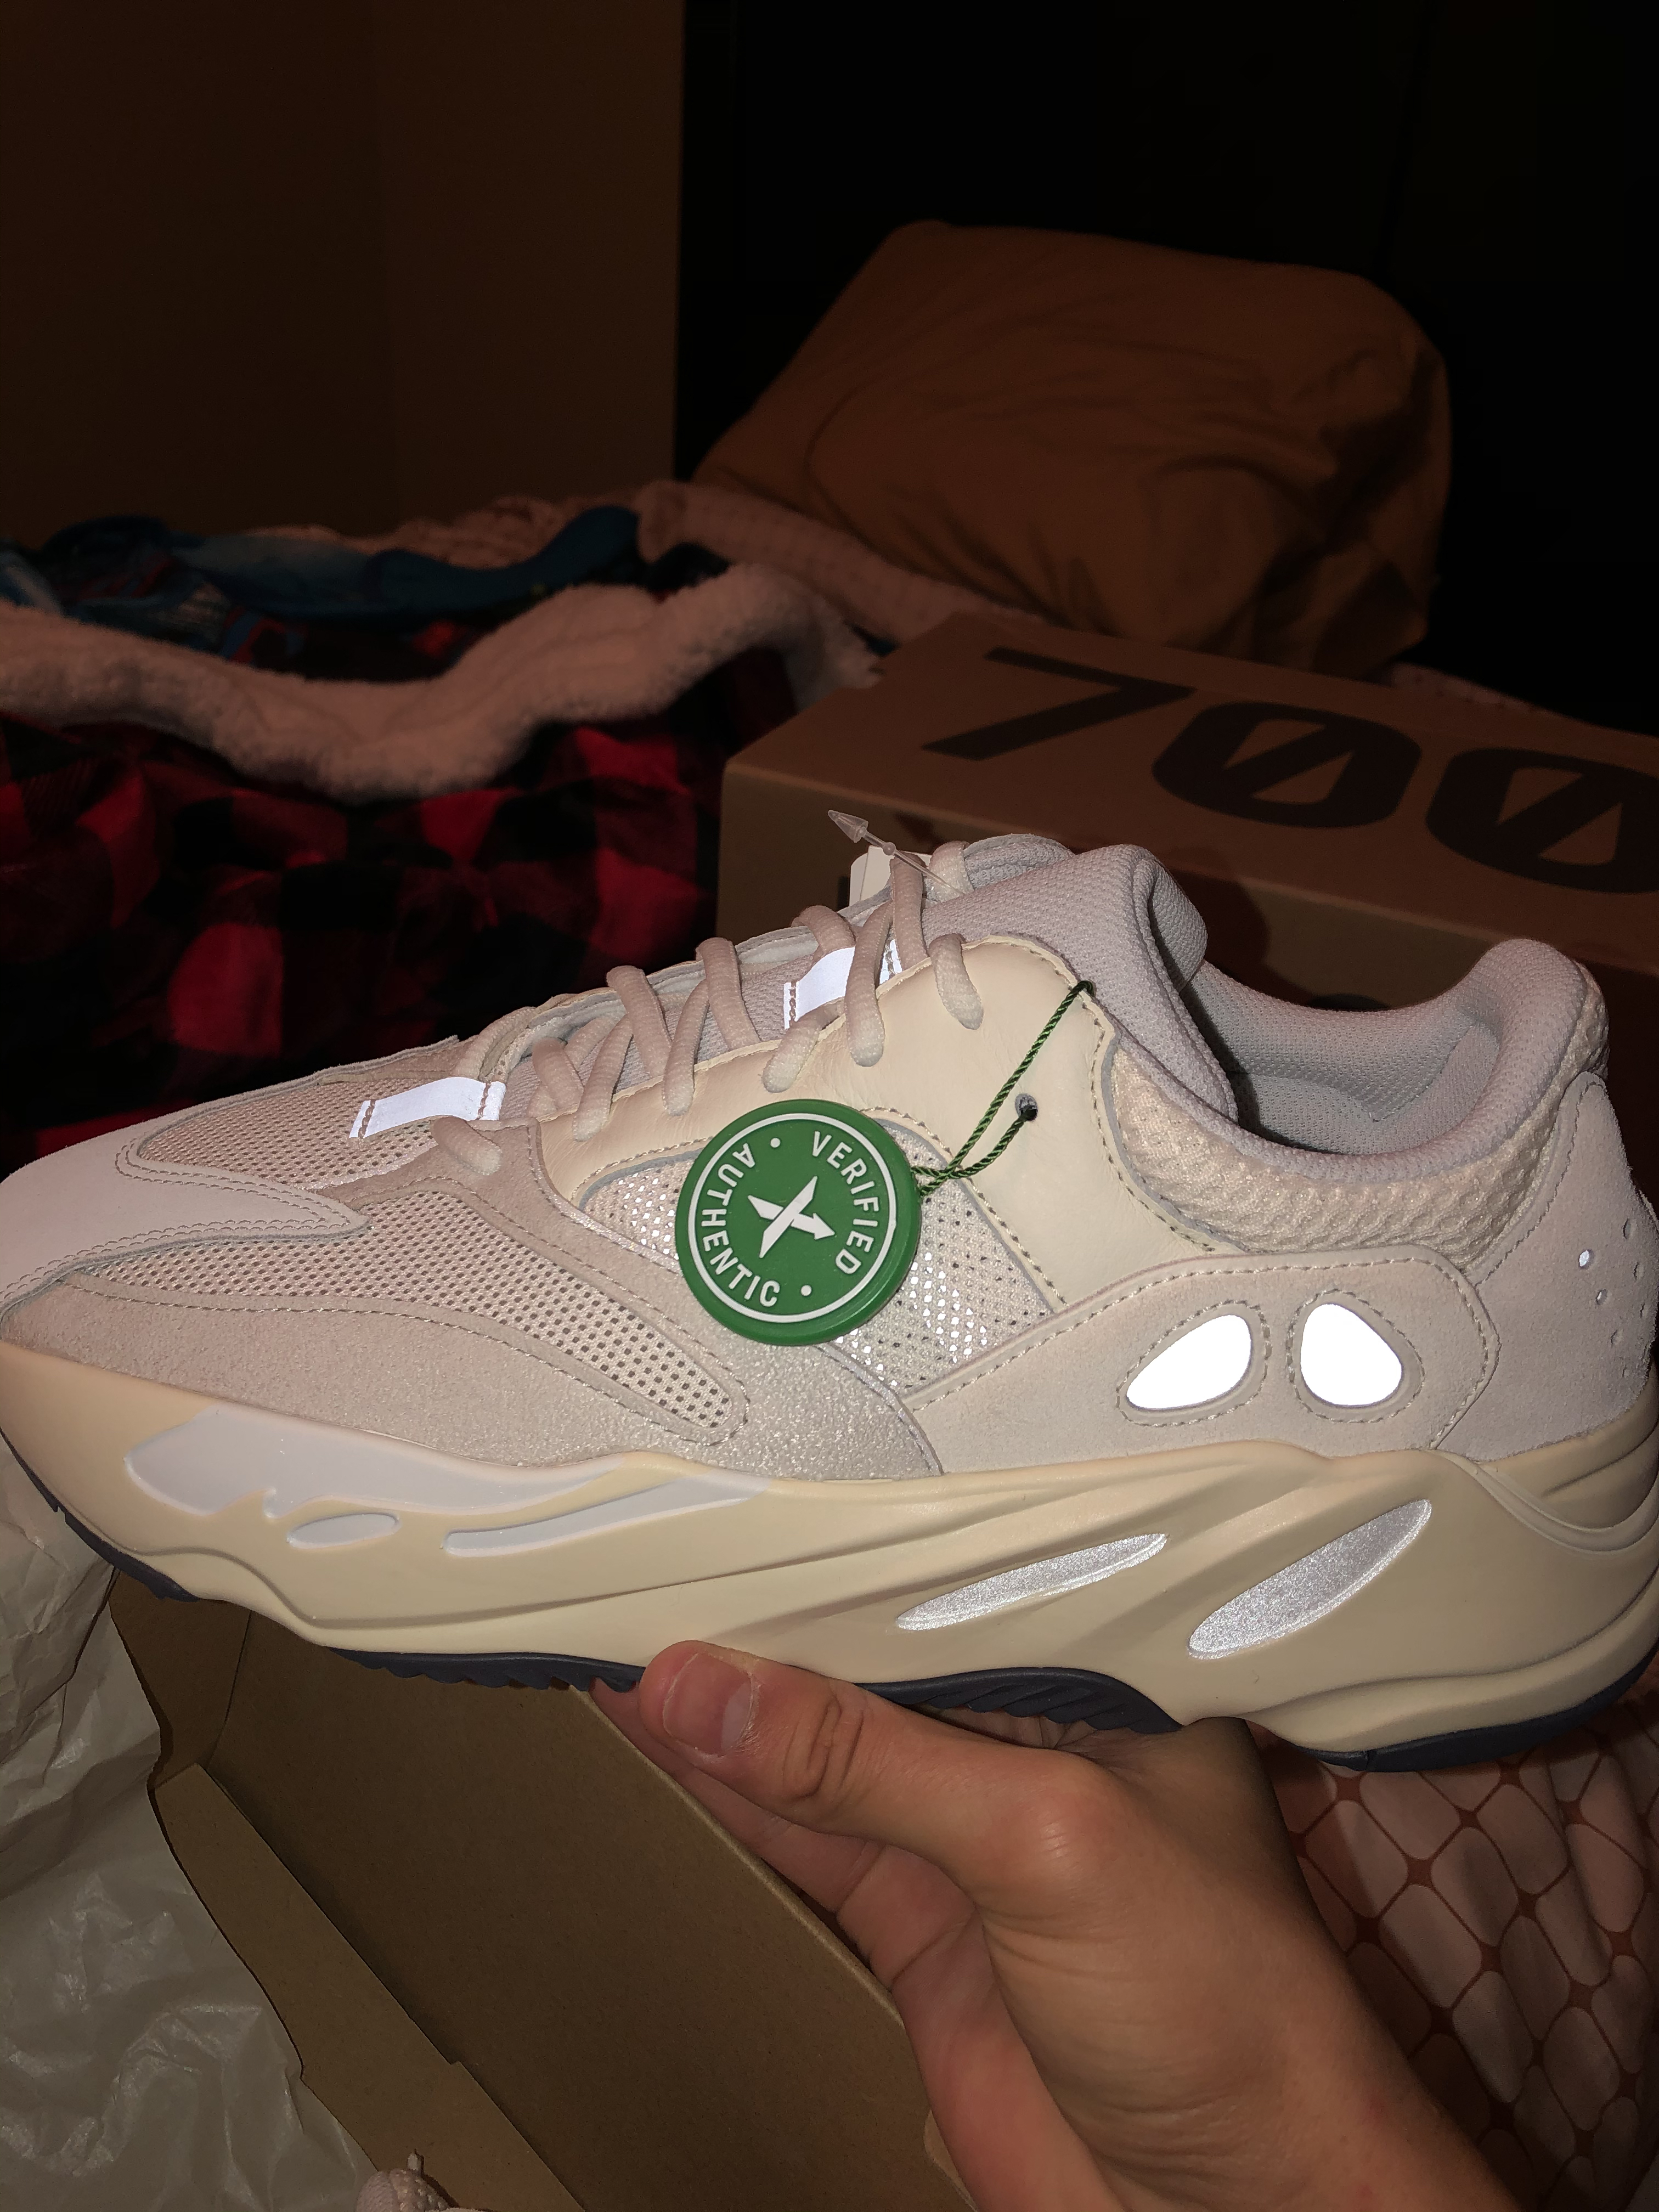 Adidas Yeezy - $230 - Size 11